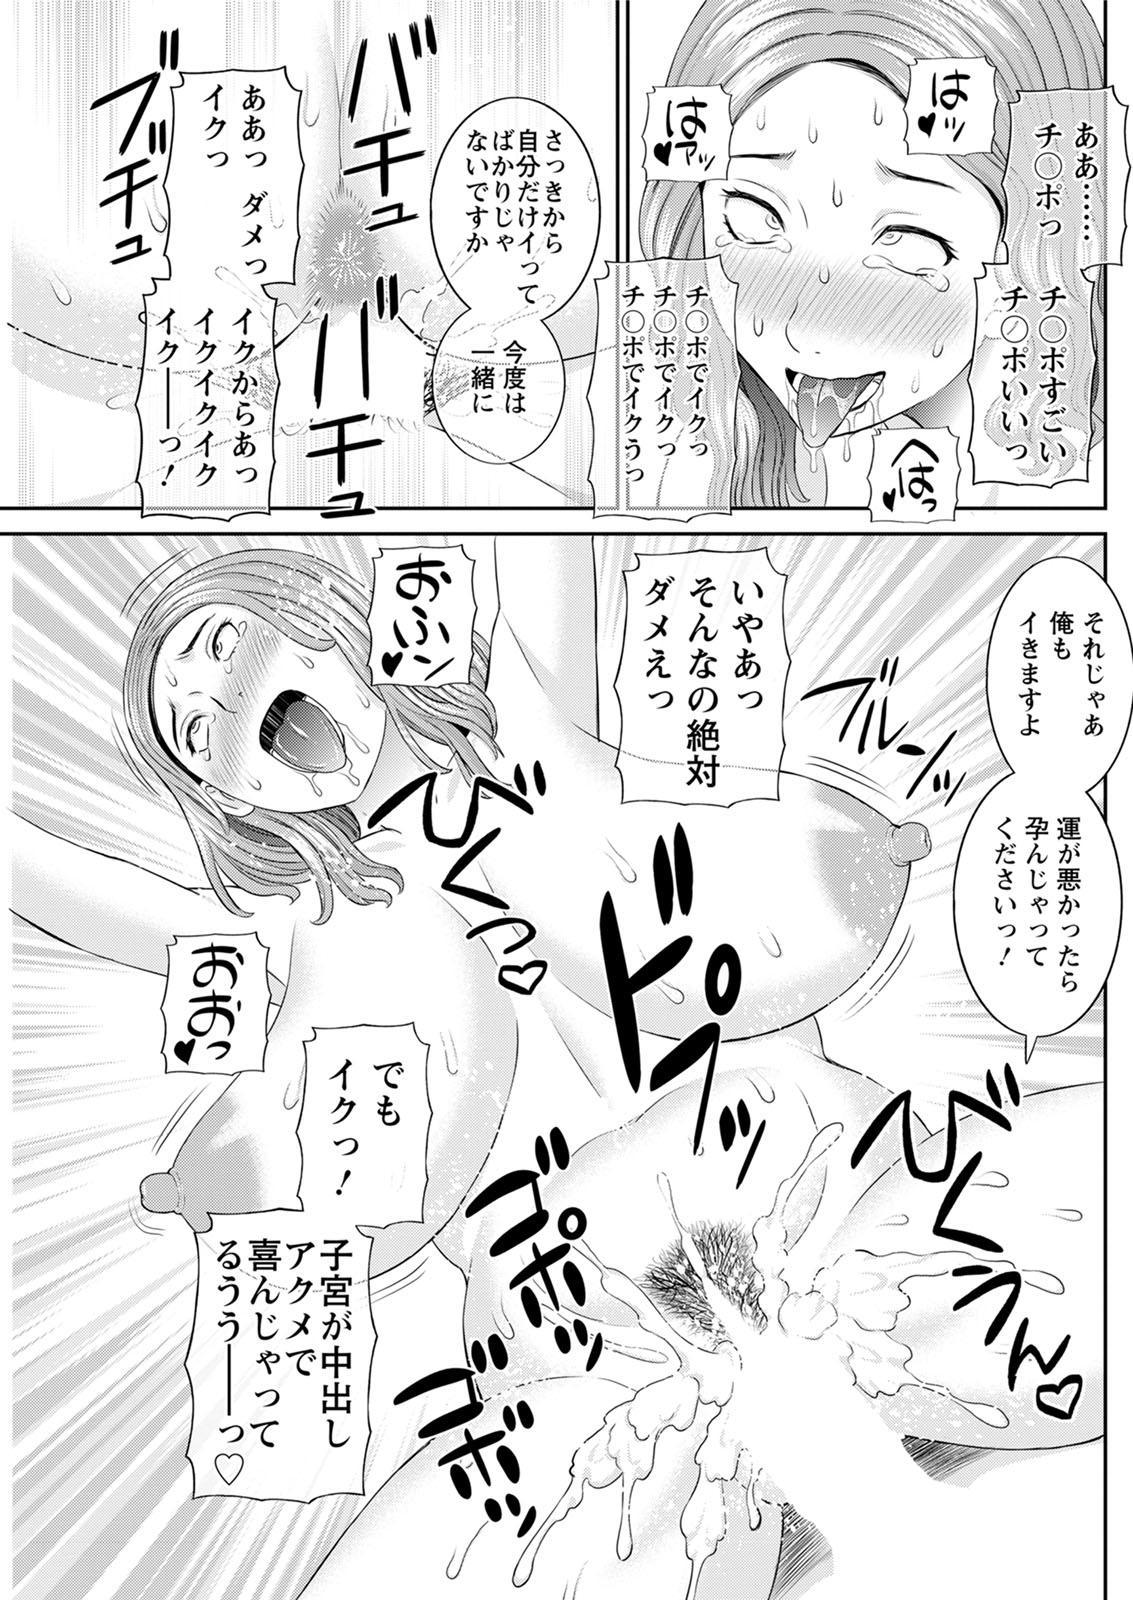 [Kawamori Misaki] Kaikan Hitotsuma Gakuen Ch. 1-6, 8-16 [Digital] 237